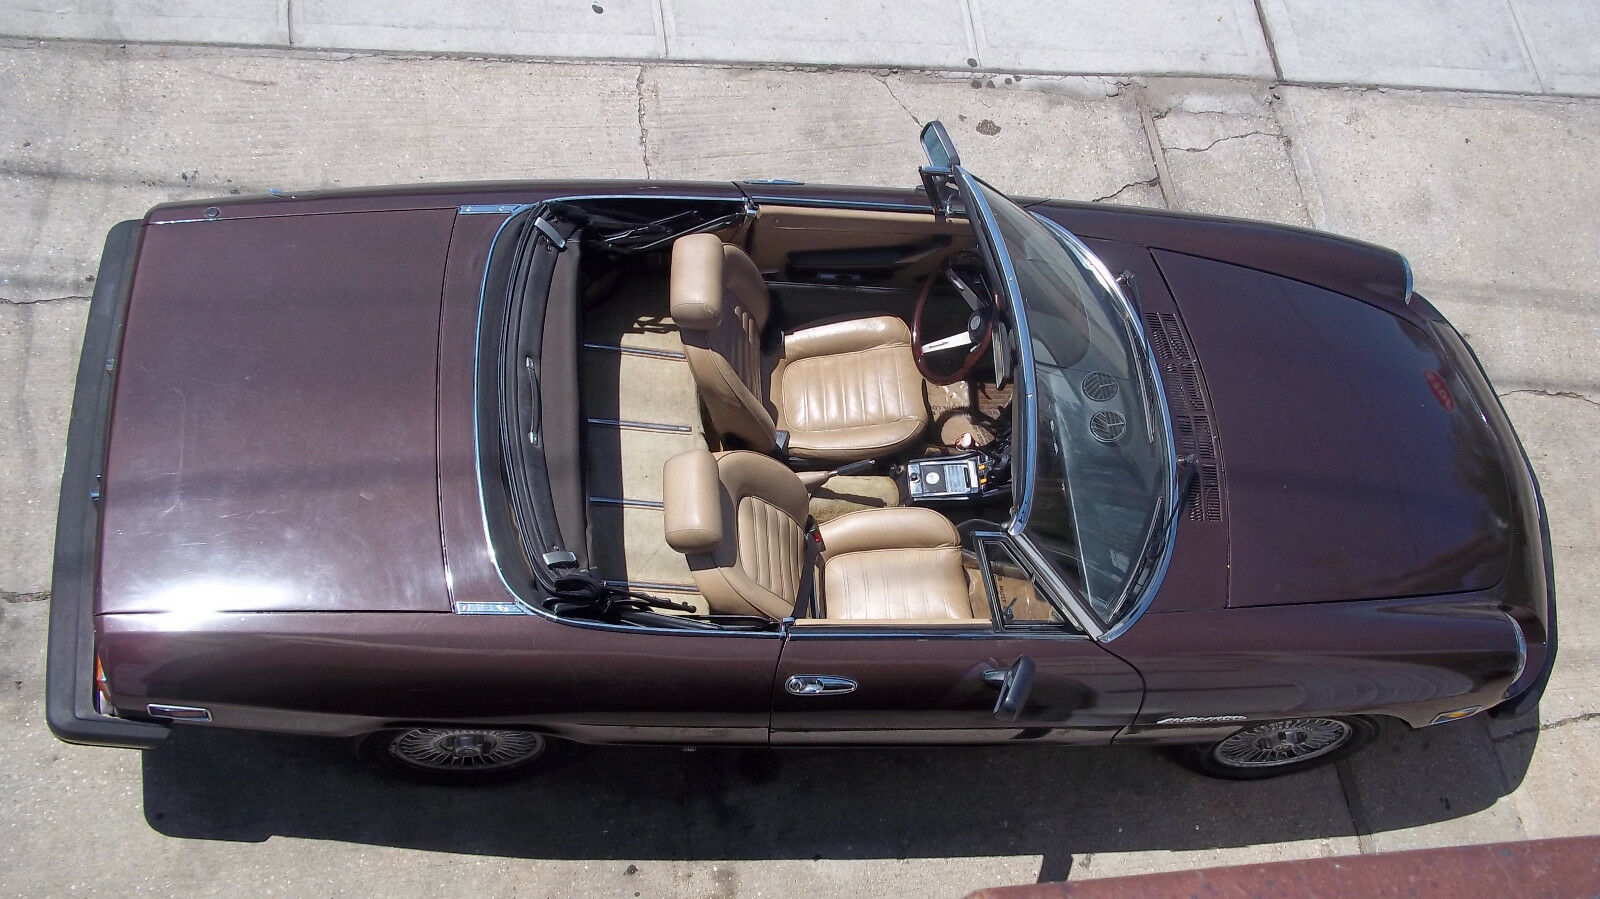 1979 Alfa Romeo Spider Veloce Roadworthy, Daily Driver.